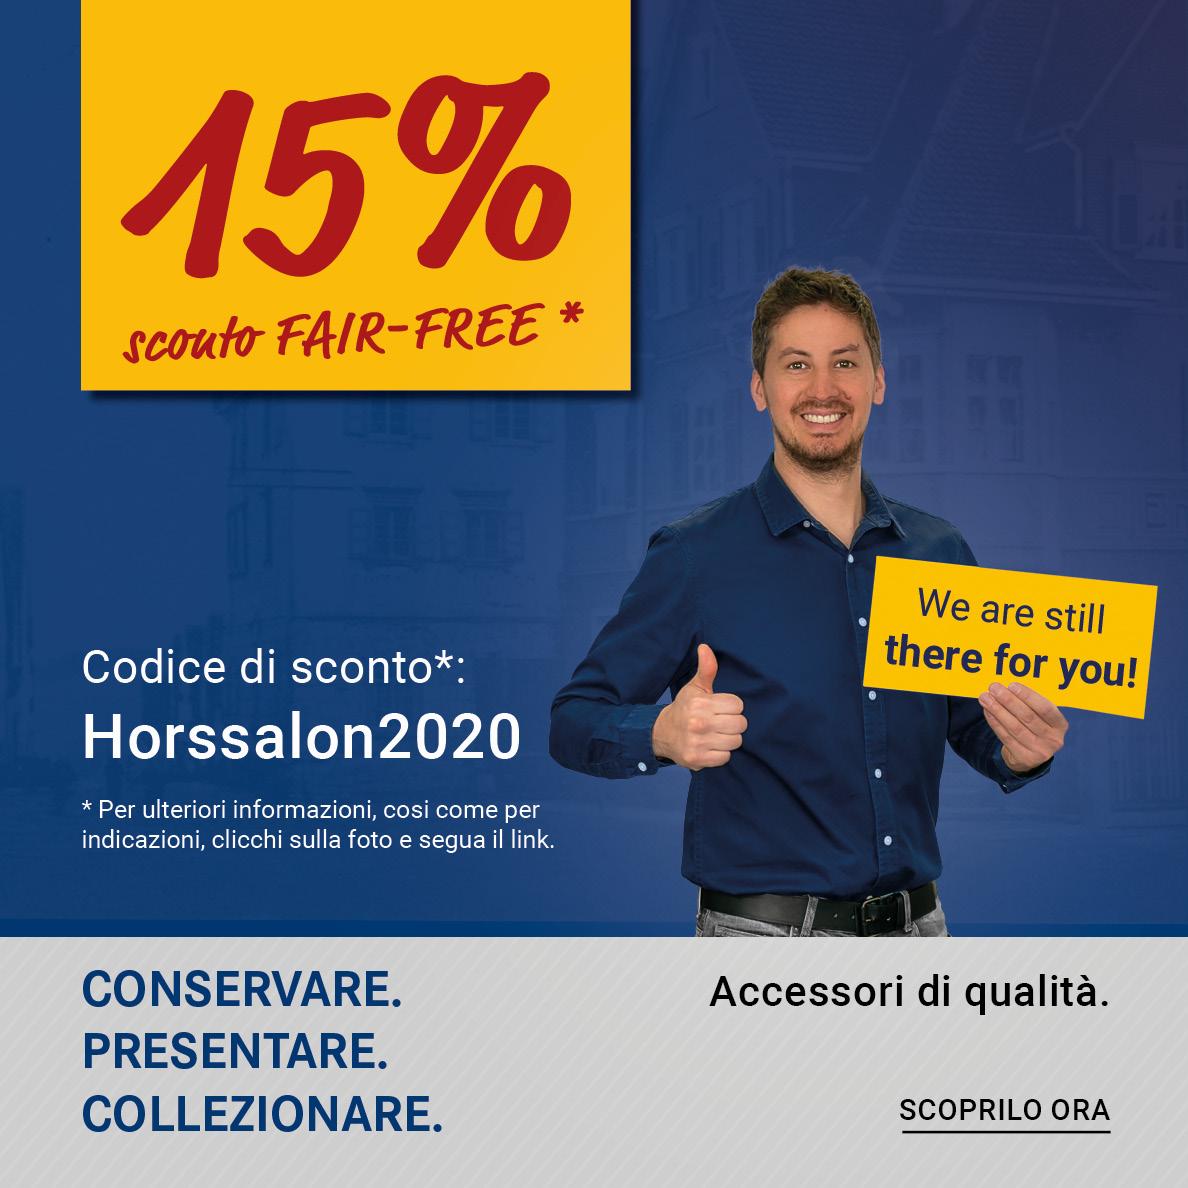 sconto-FAIR-FREE: Horssalon2020